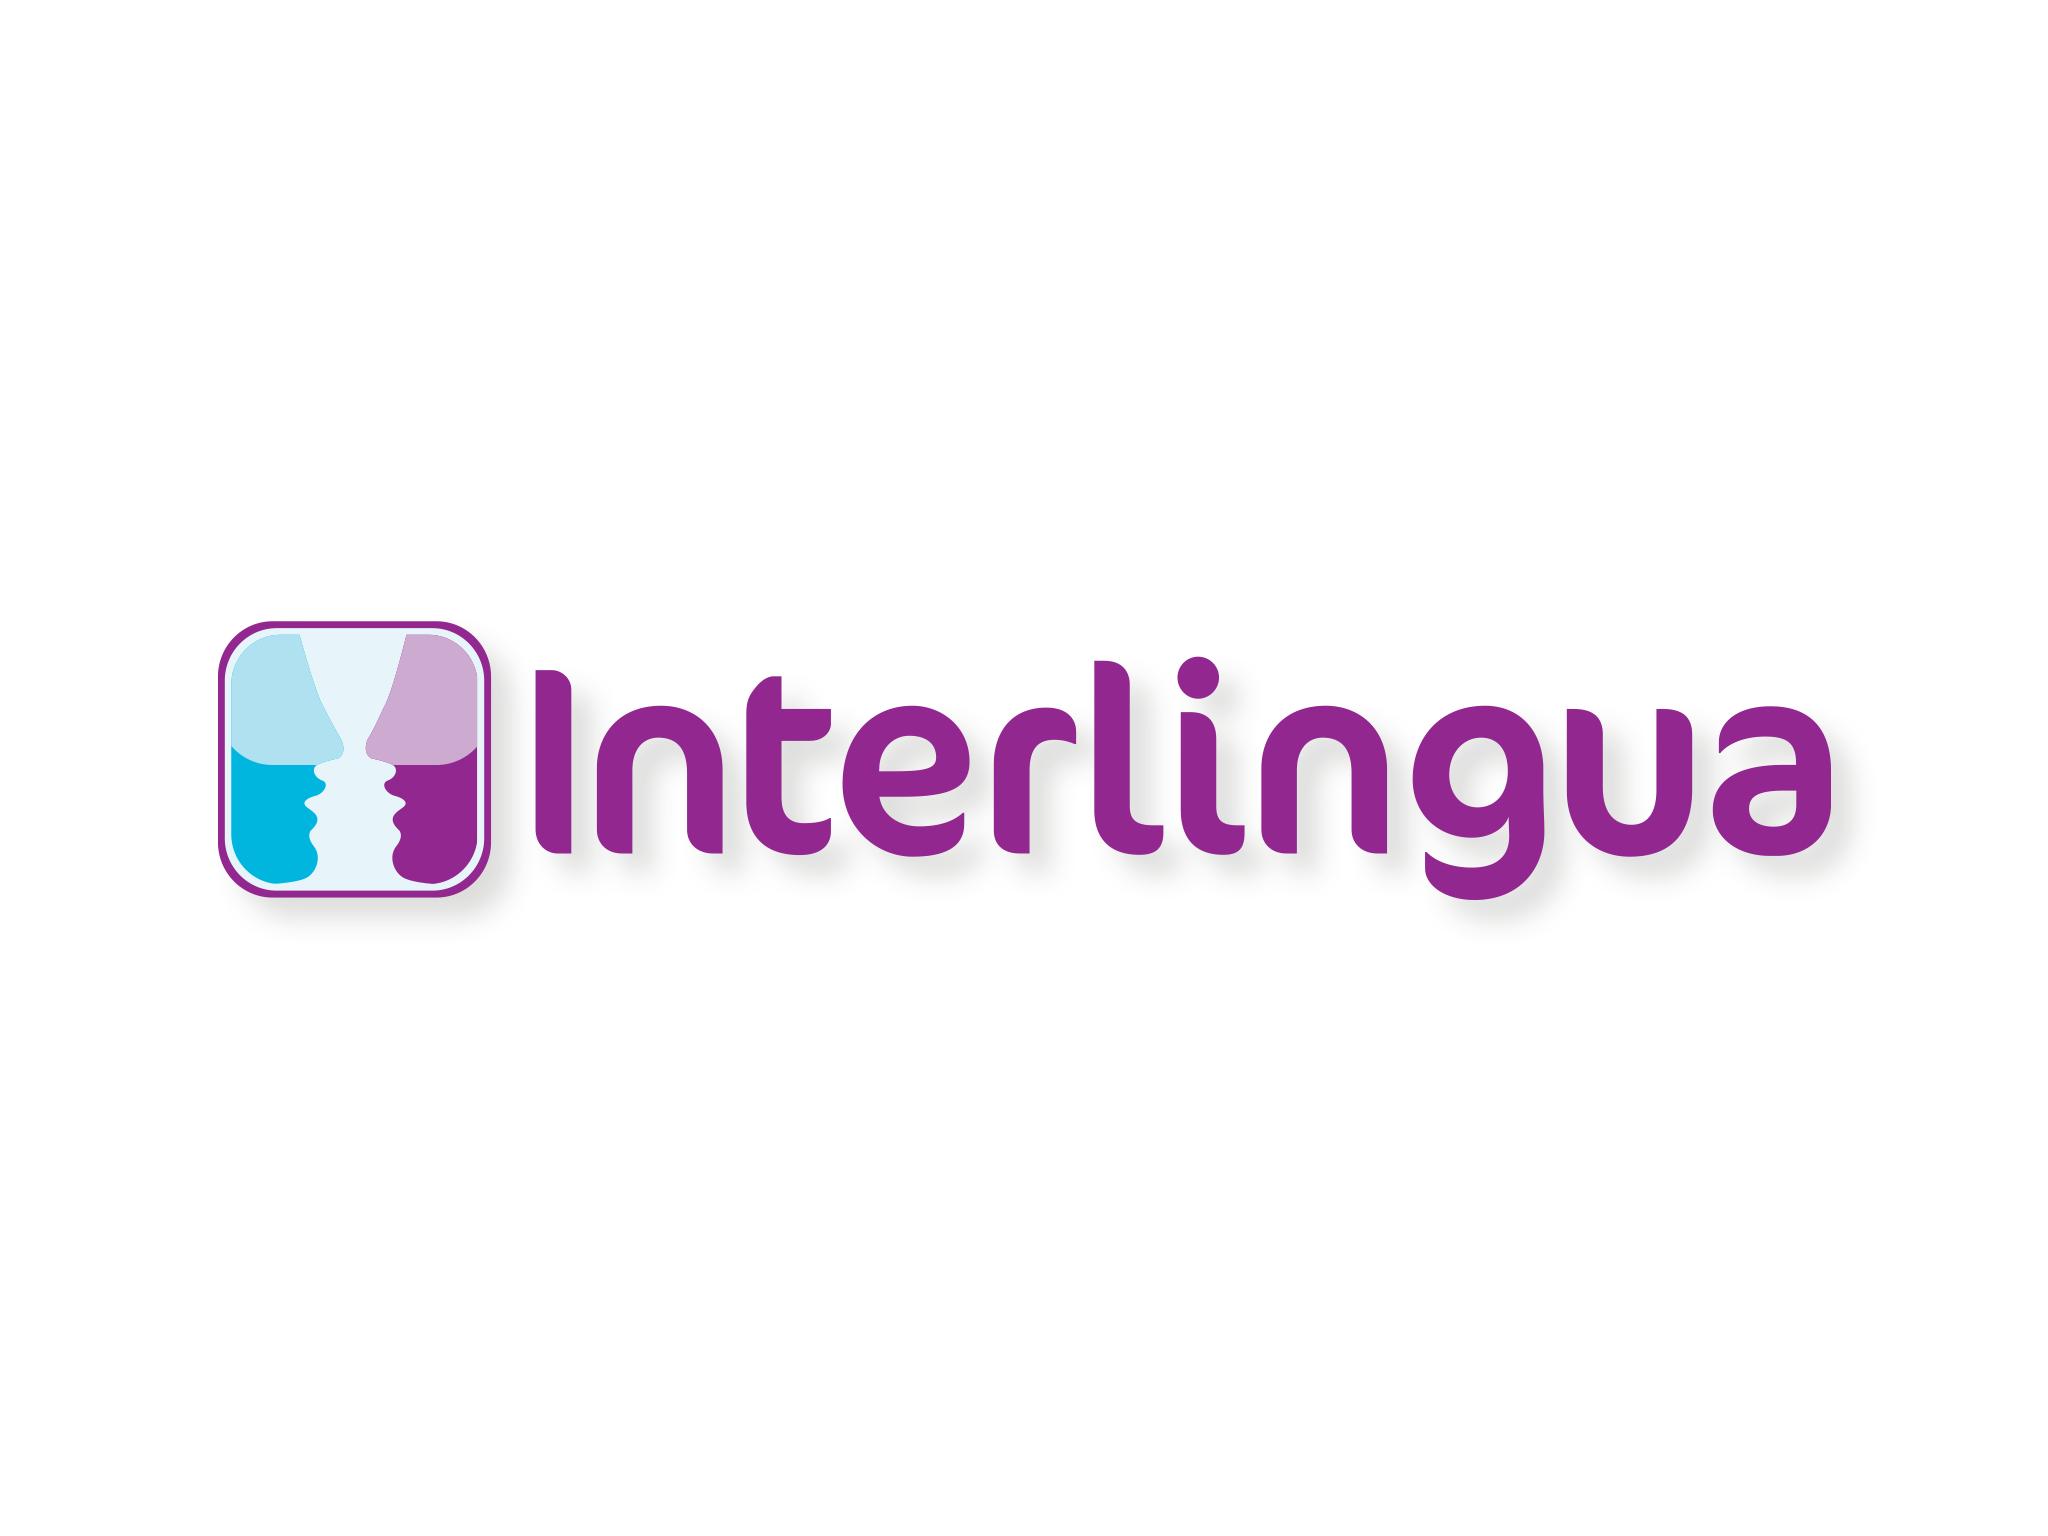 Interlingua